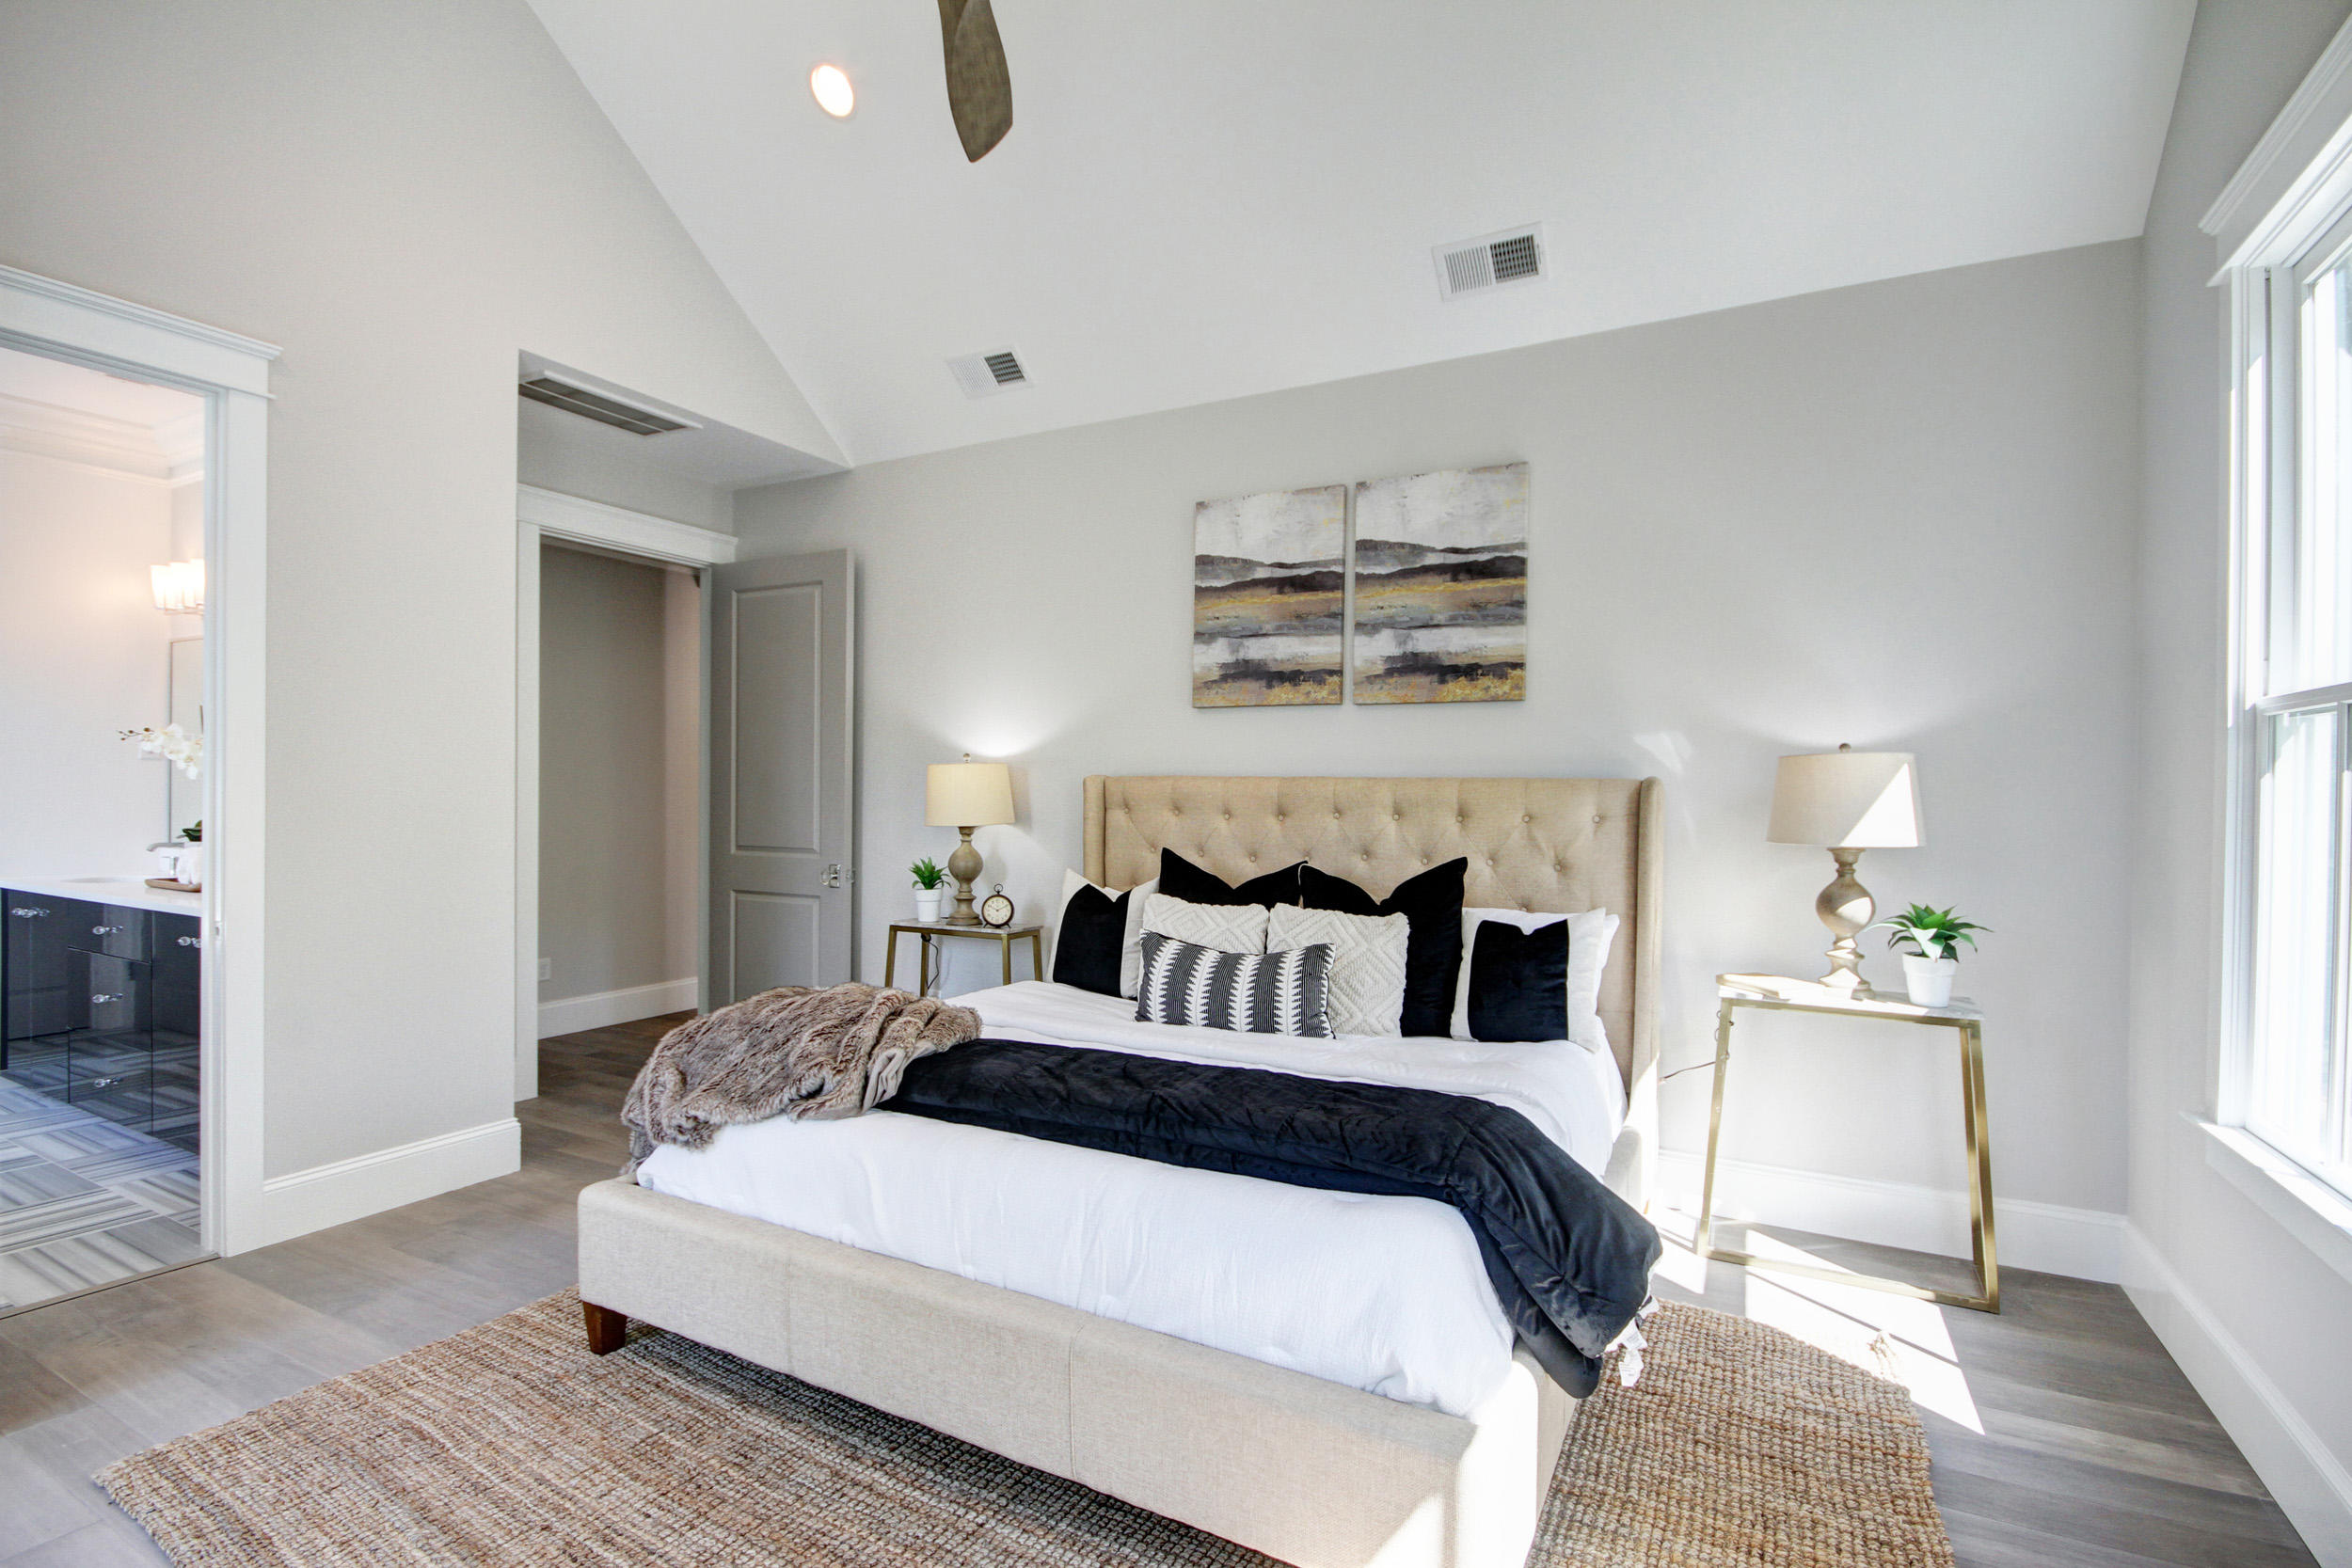 Mathis Ferry Court Homes For Sale - 1212 Clonmel Place, Mount Pleasant, SC - 9